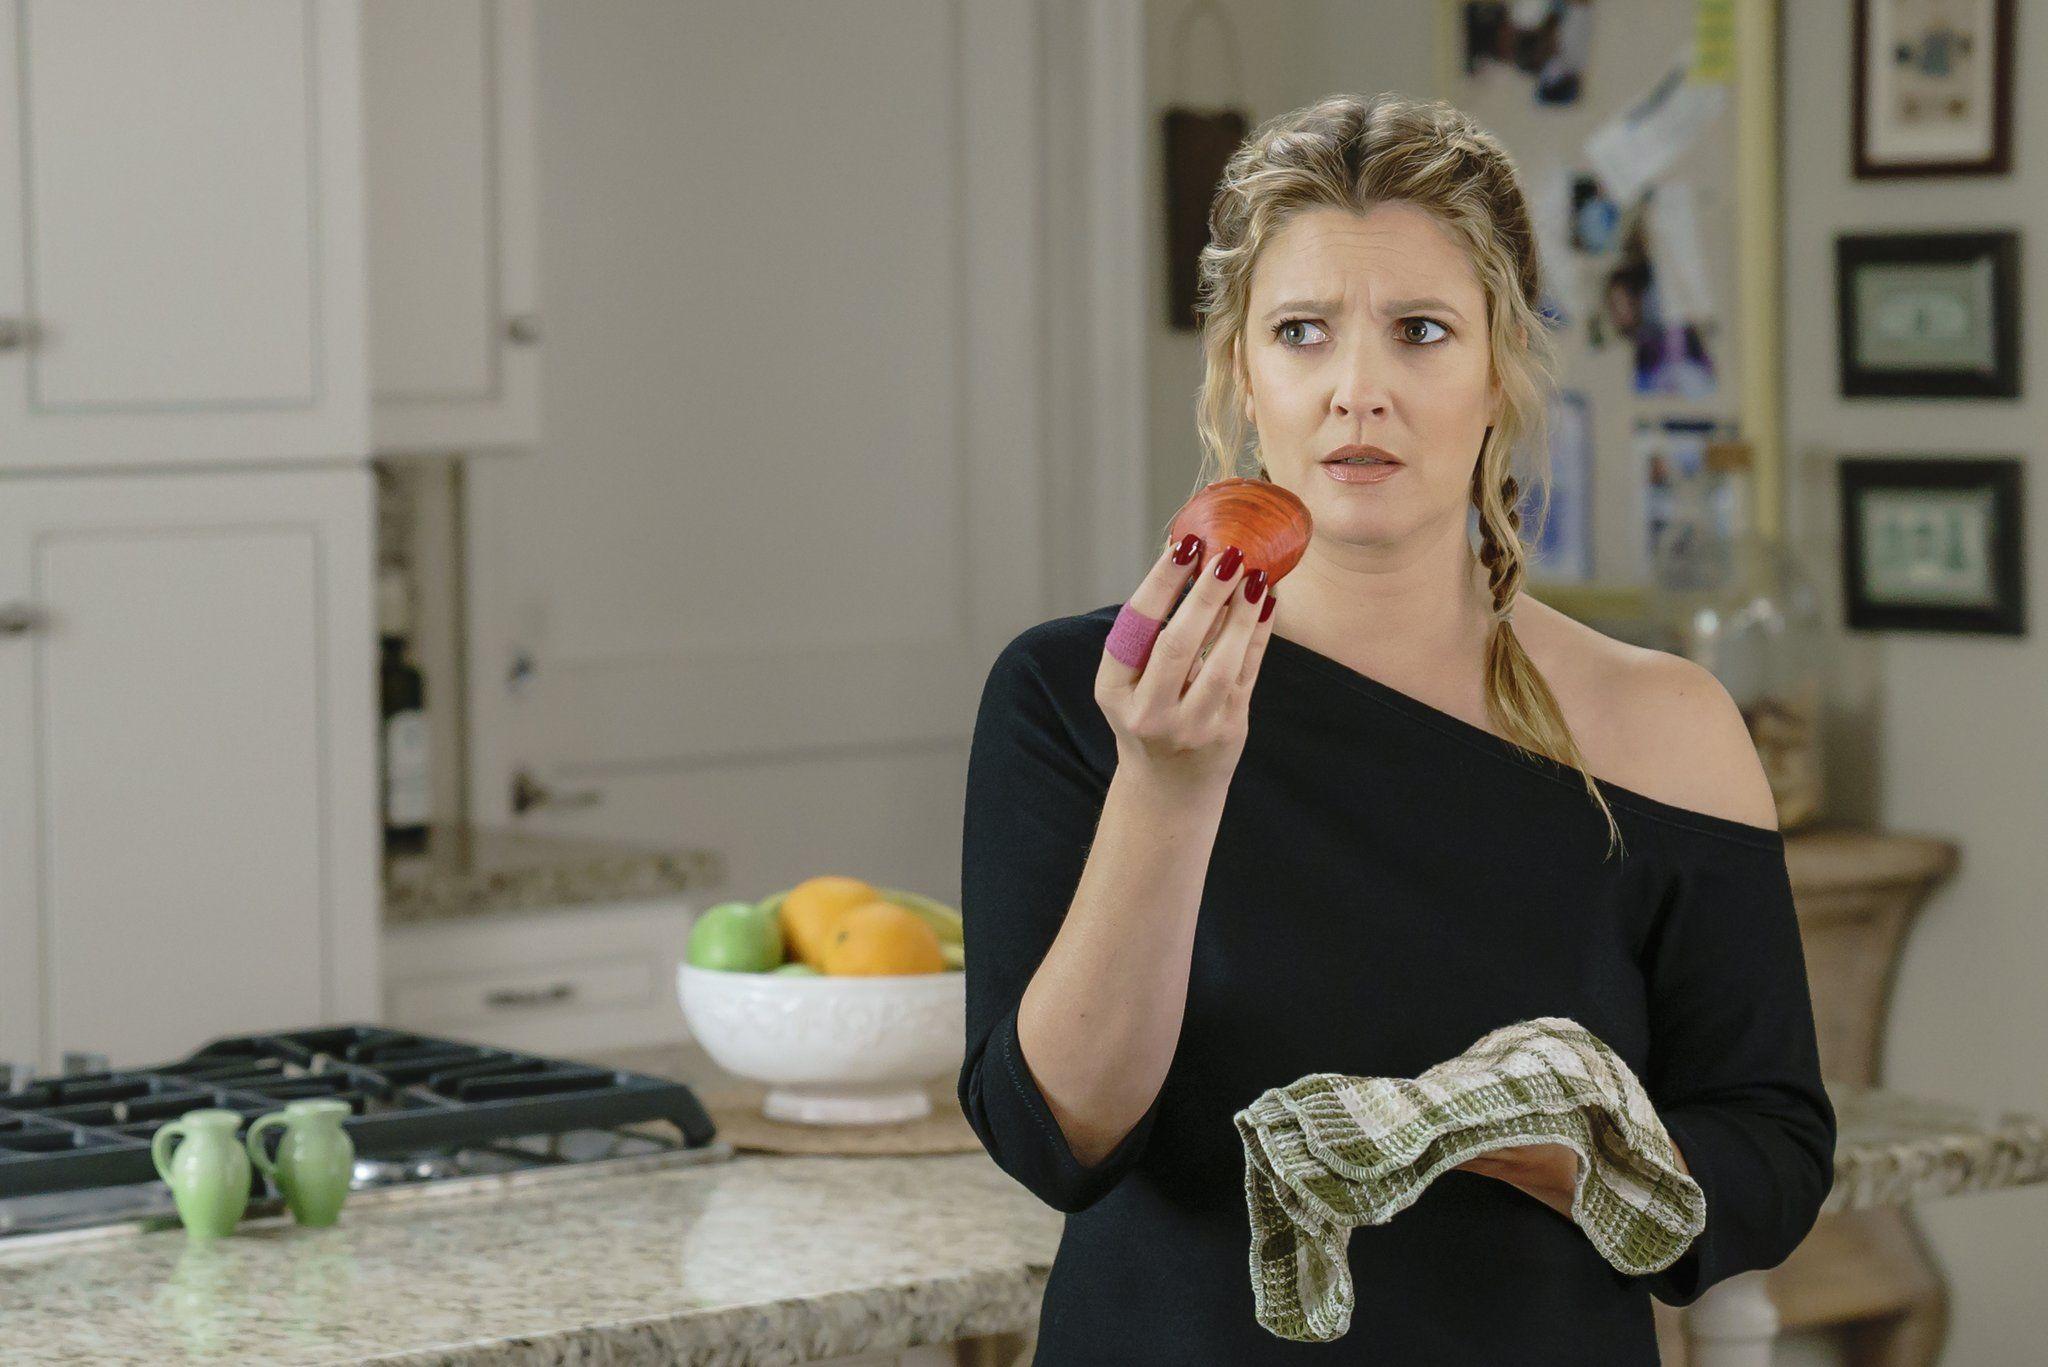 Drew Barrymore santa clarita diet looking at fruit